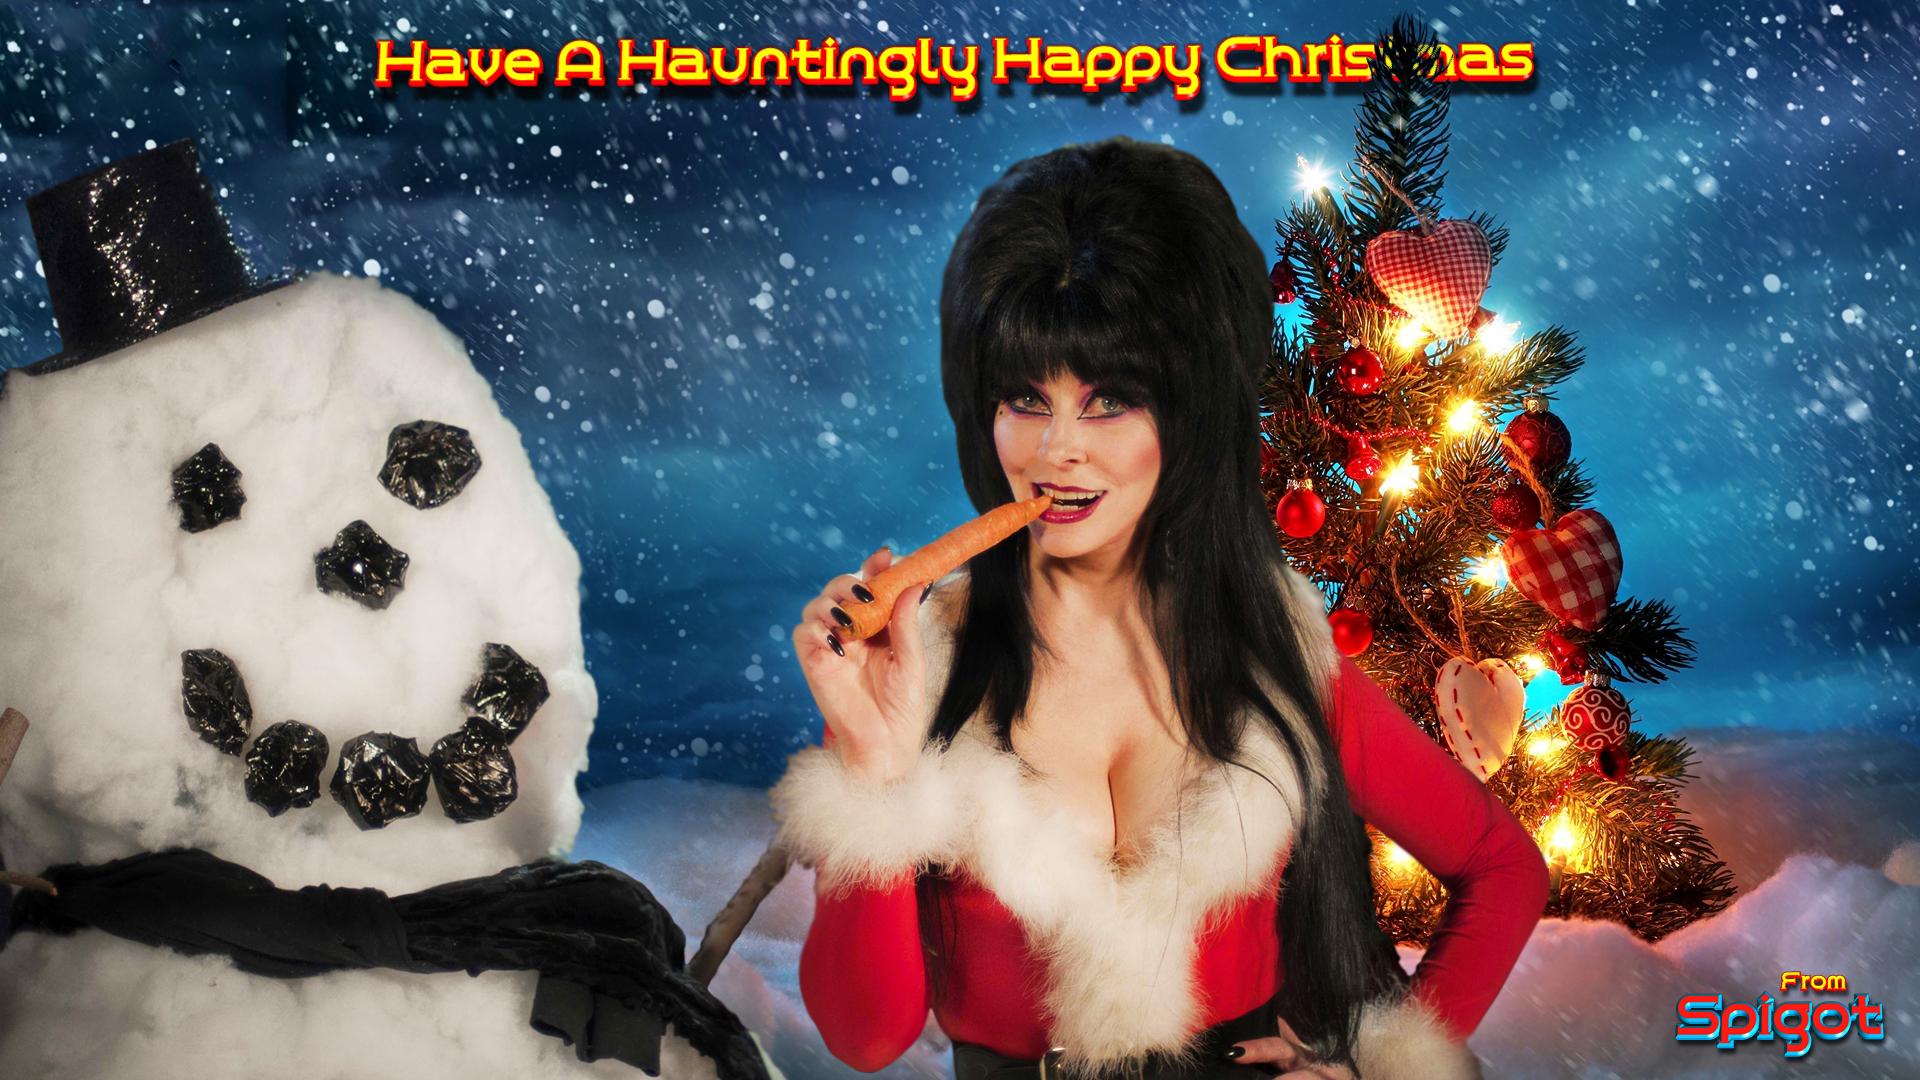 Elvira Christmas Wallpaper | George Spigot's Blog